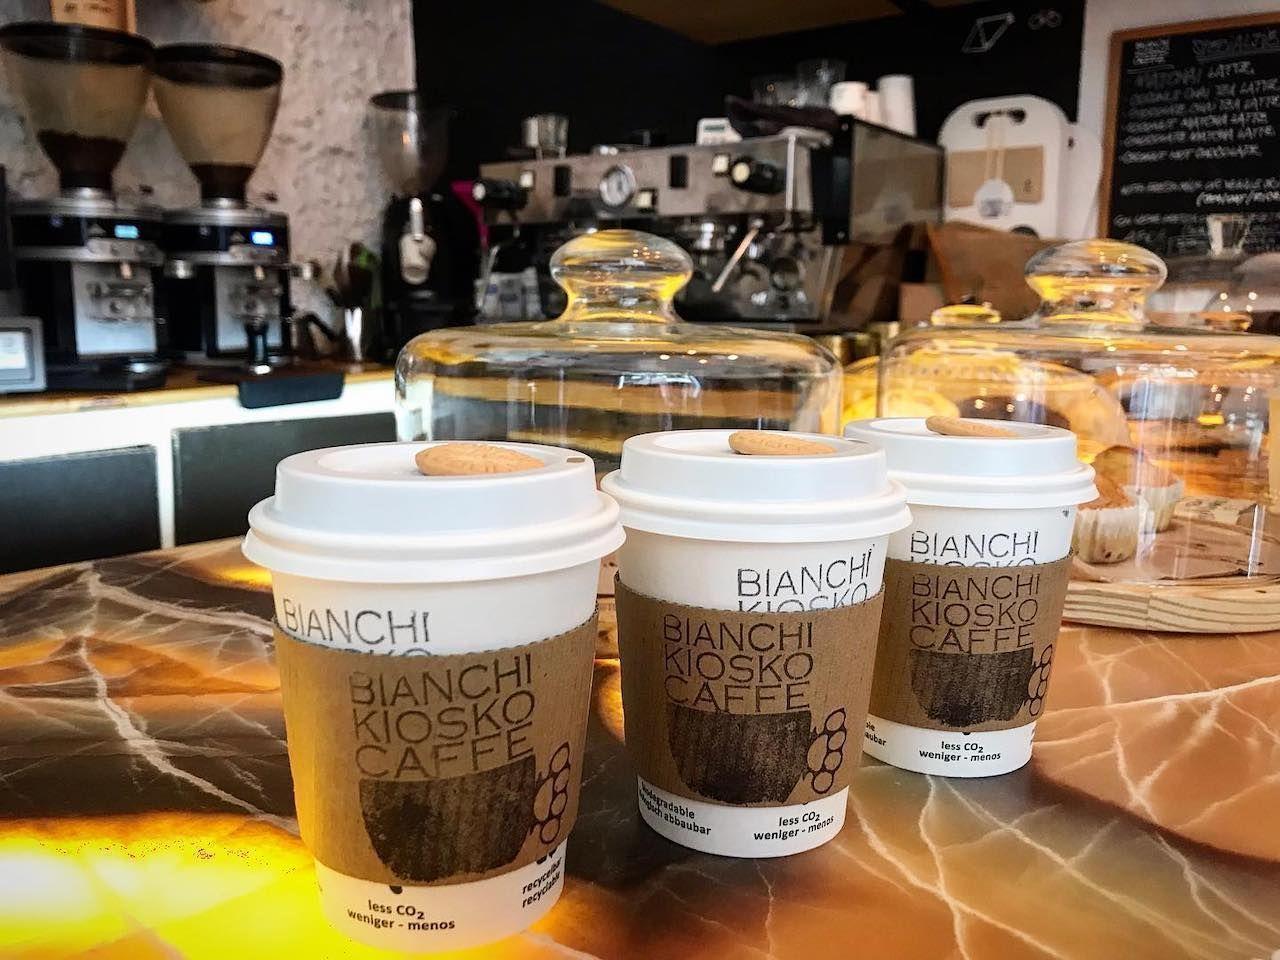 Bianchi kiosko caffe